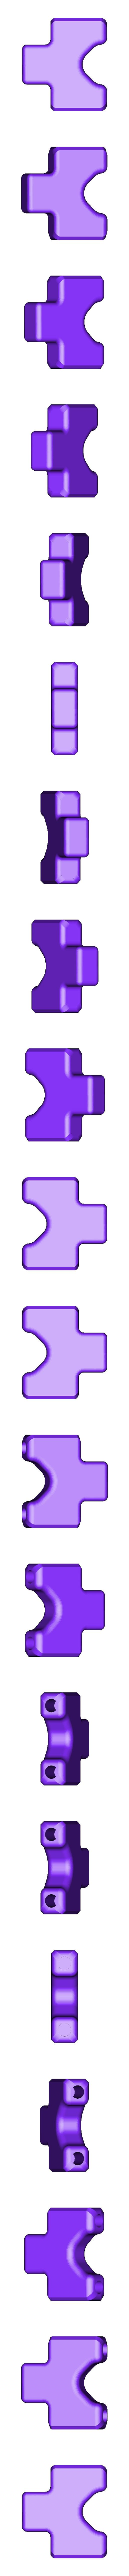 Main_Upper_Part_knife_mount.stl Download free STL file Kitchen Rail • Template to 3D print, MakerMind